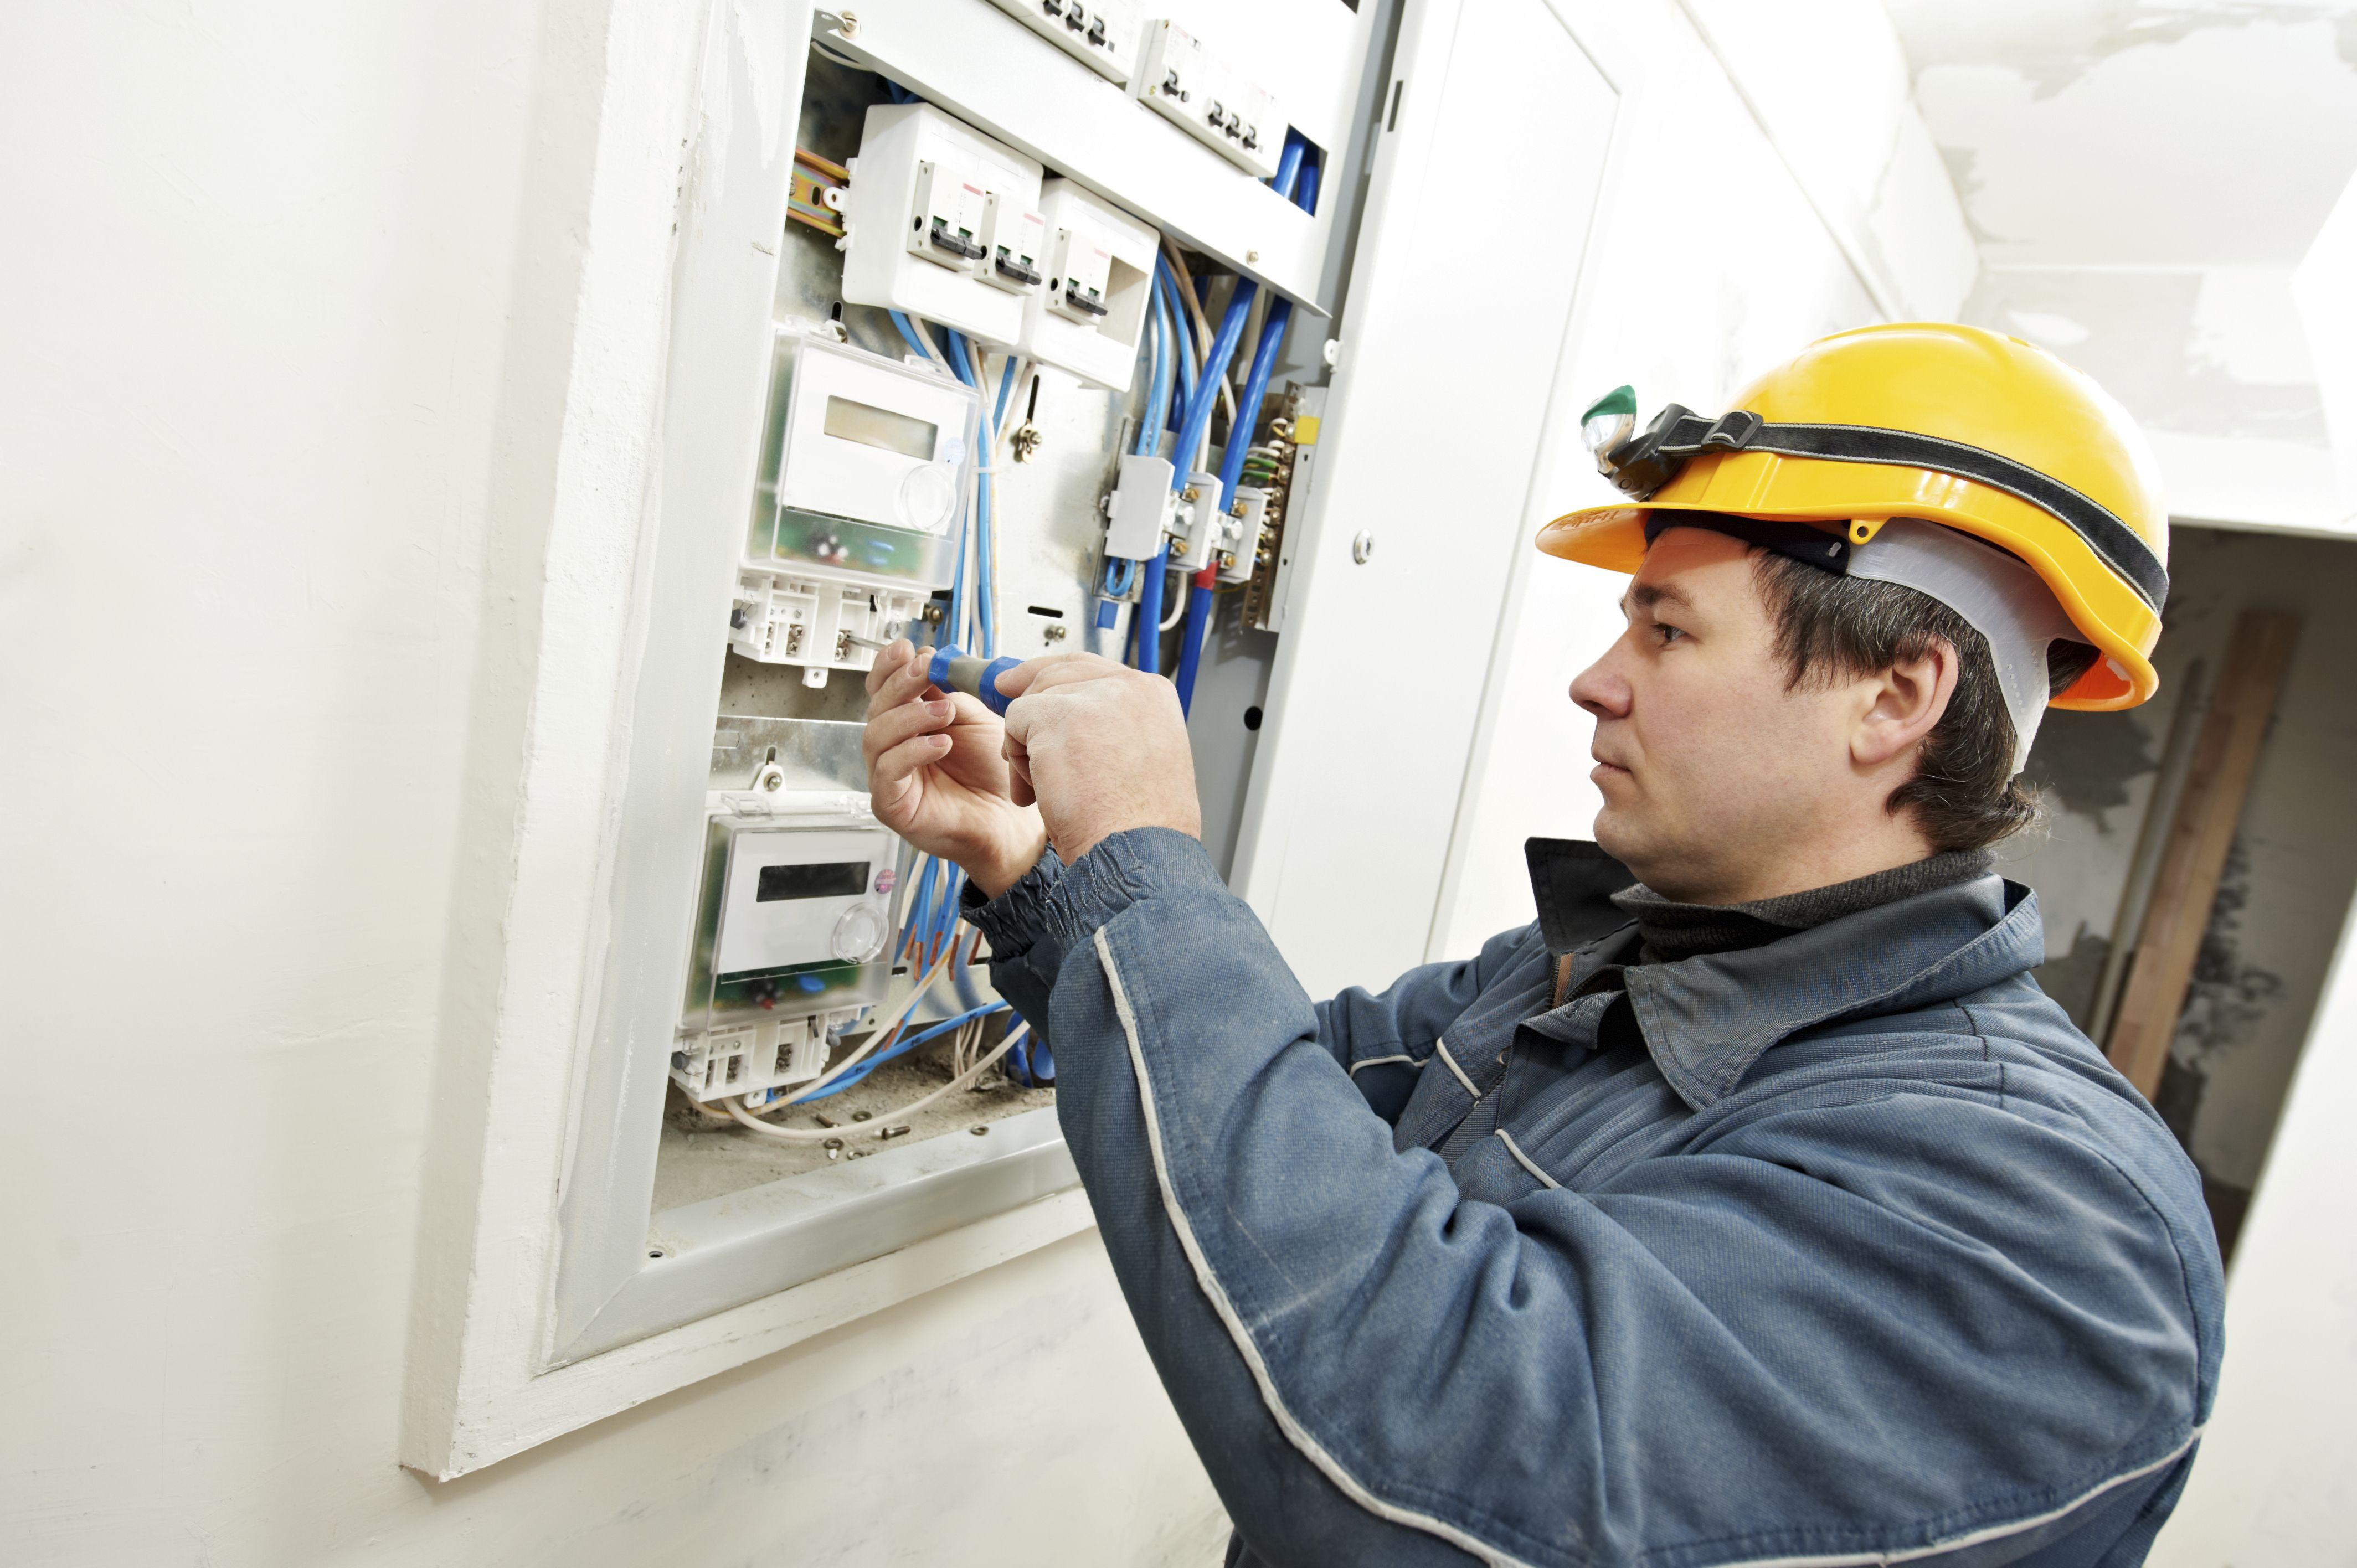 Cuadros eléctricos: Servicios de Eléctrica M. Perello